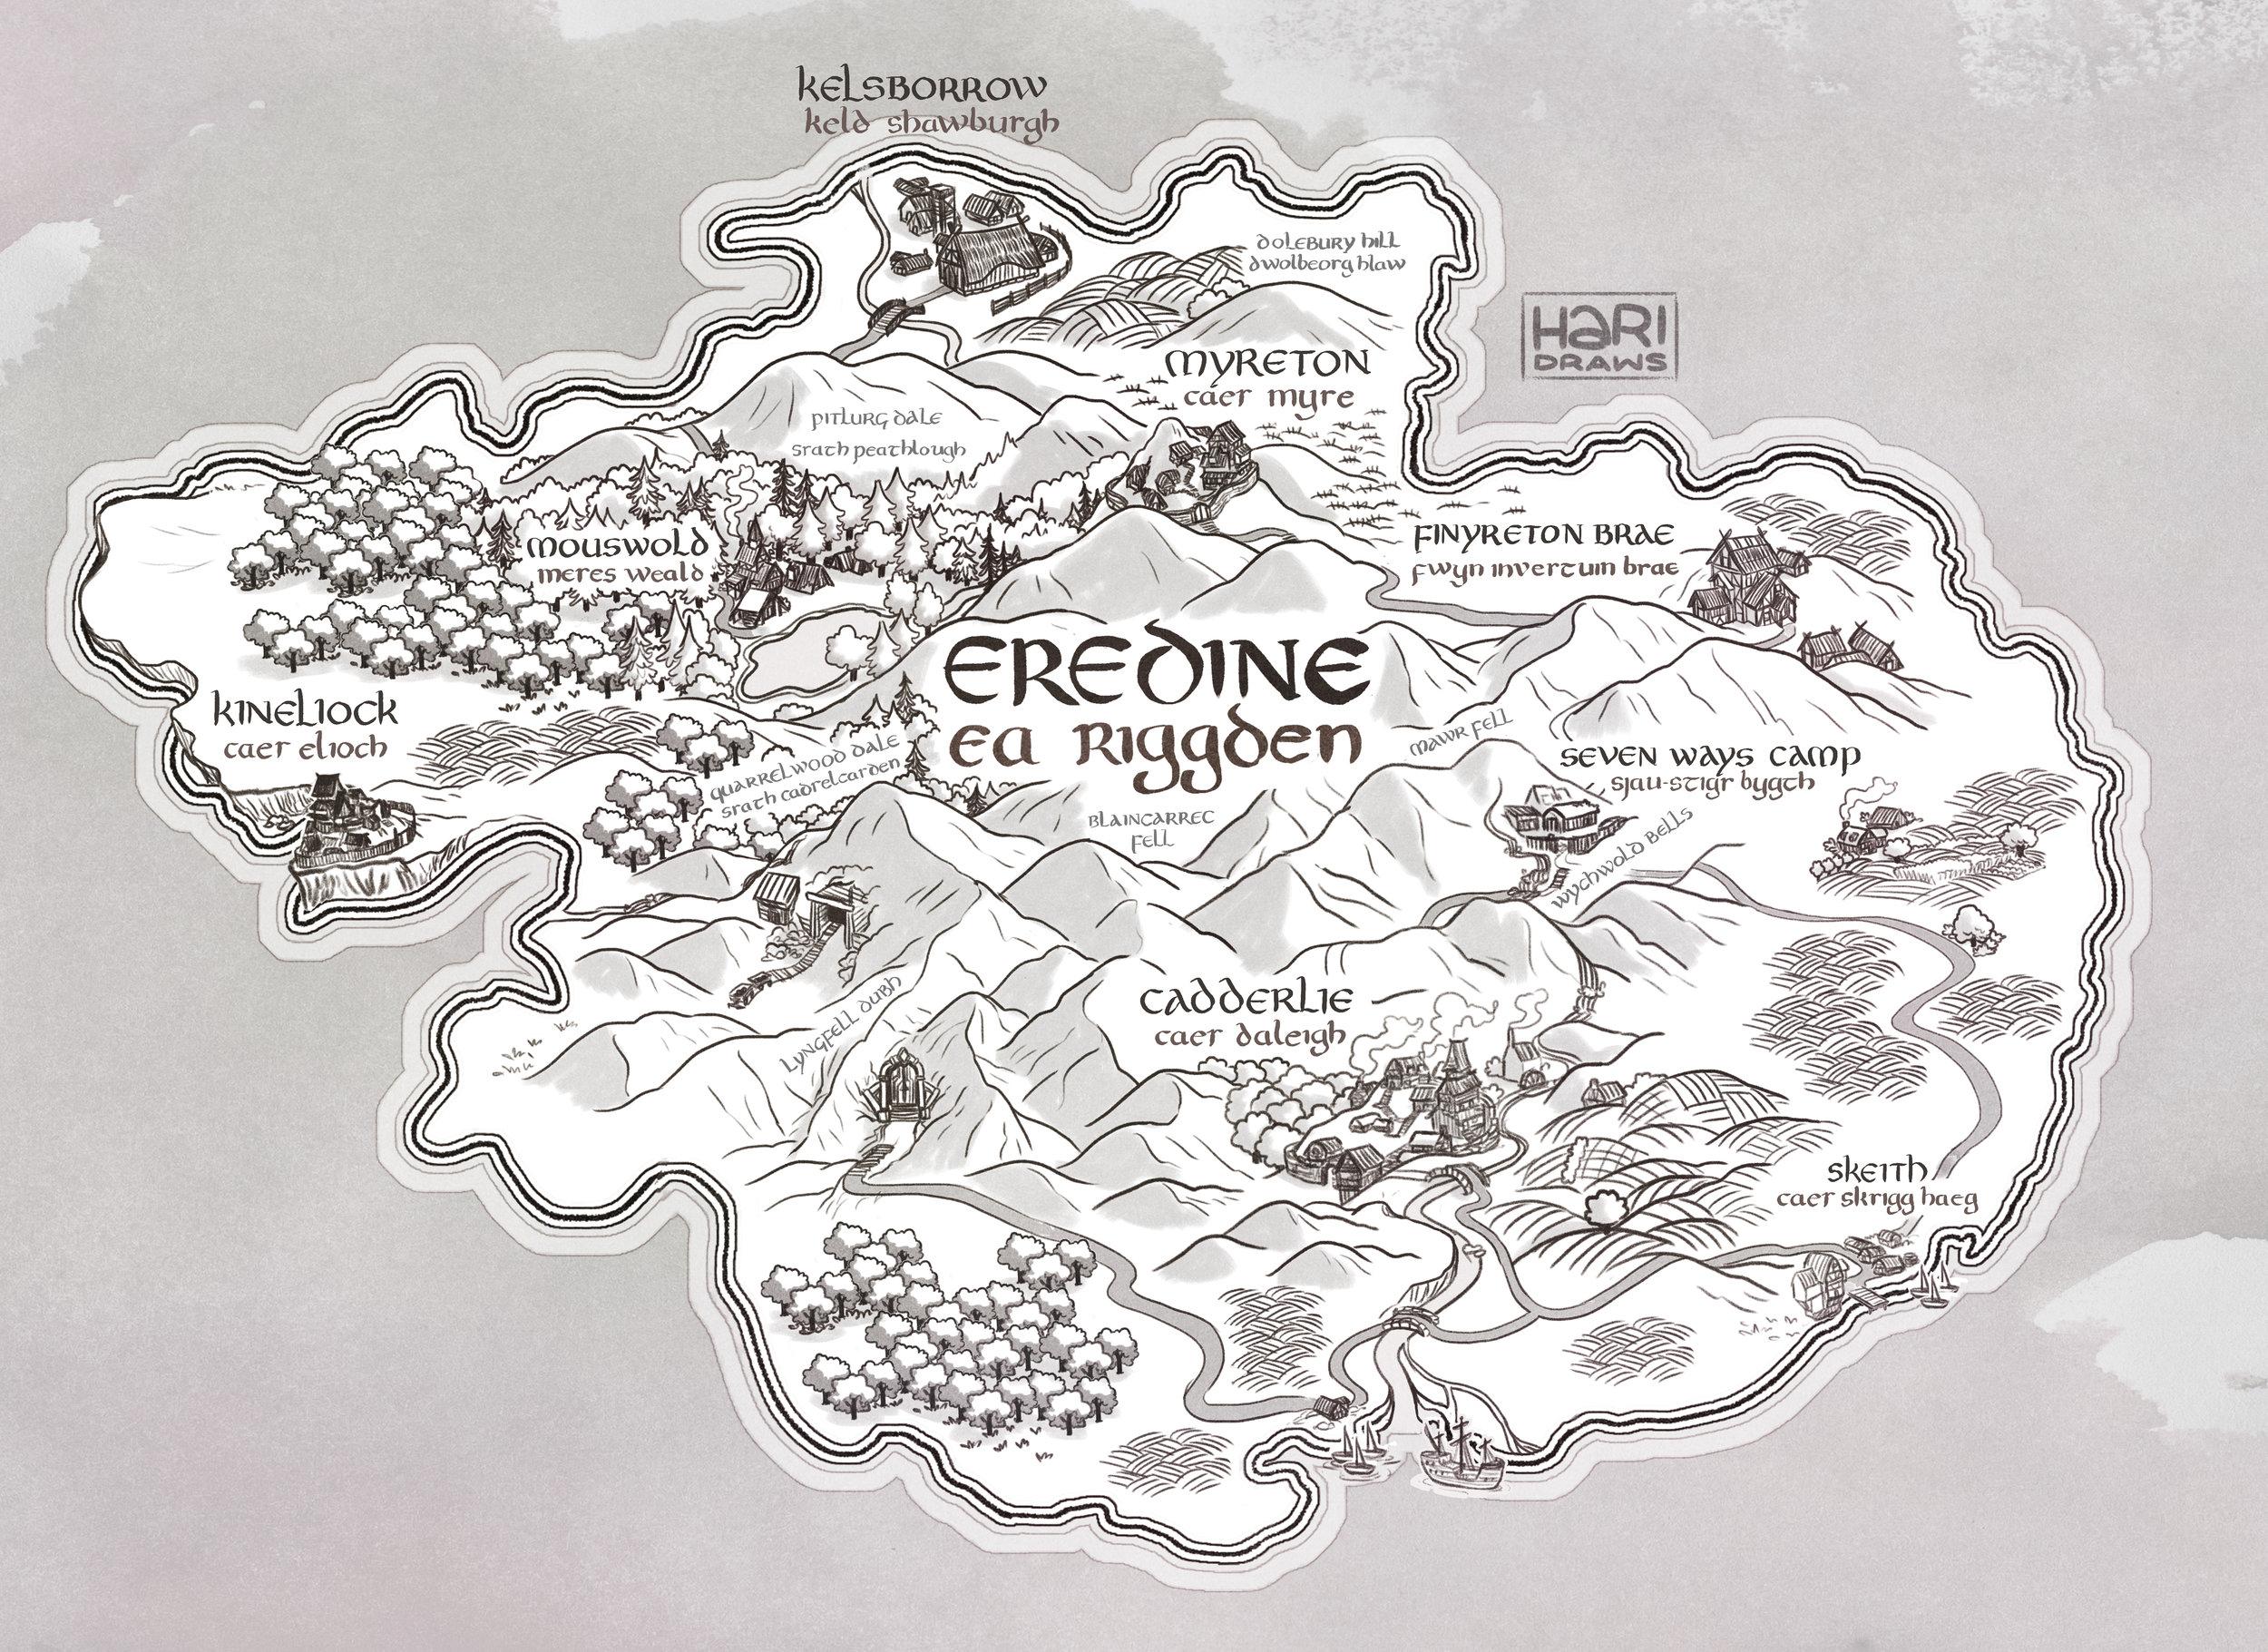 Map of eredine.jpg